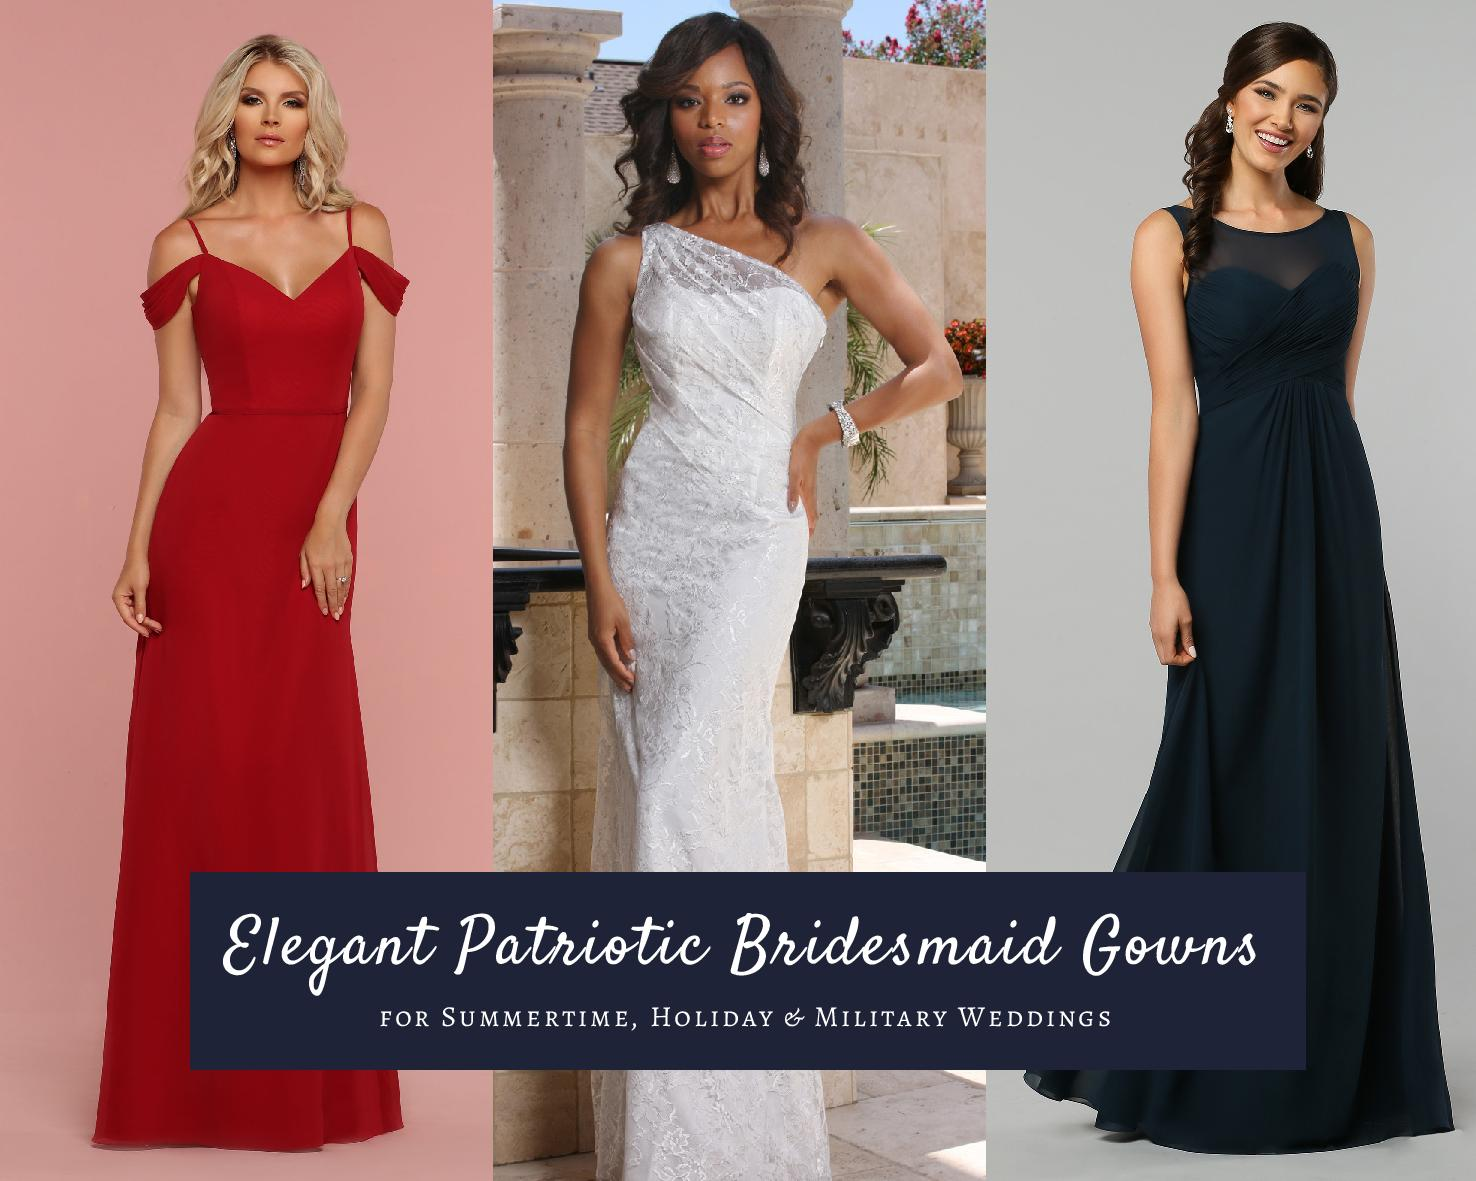 Elegant Patriotic bridesmaid gowns   DaVinci Bridal Blog